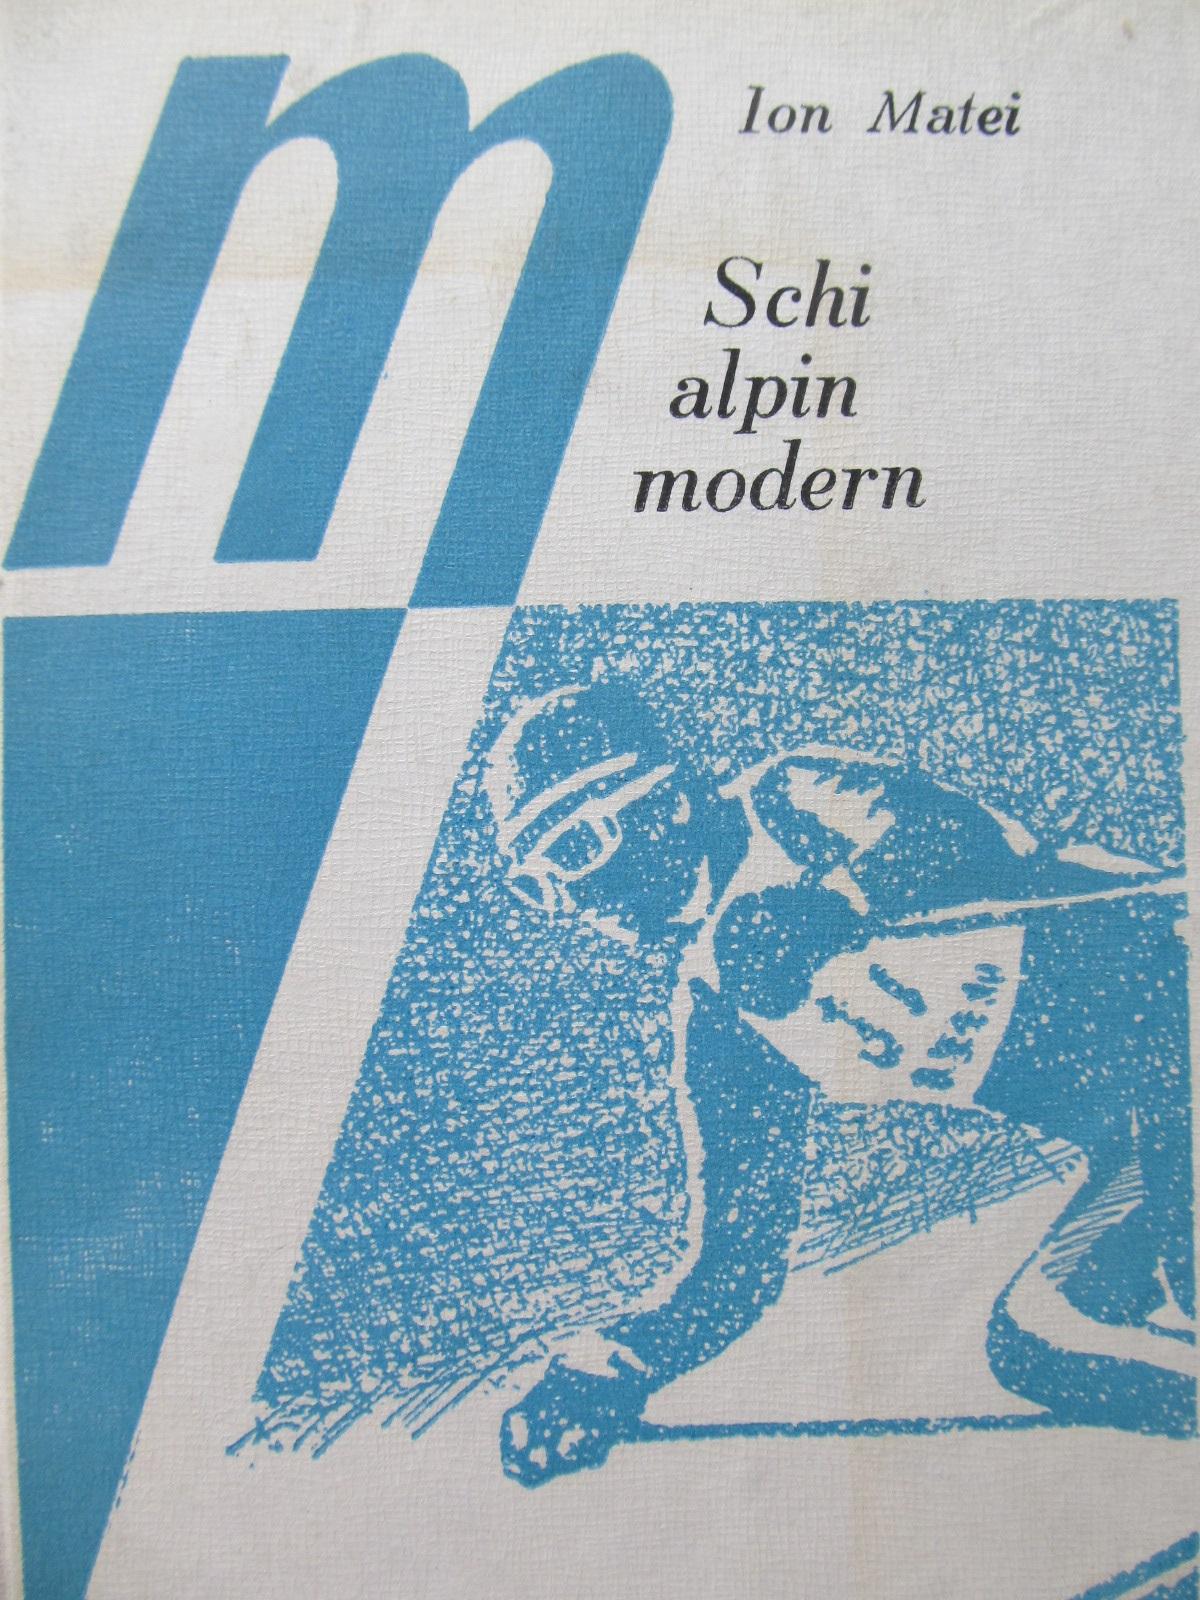 Schi alpin modern - Ion Matei | Detalii carte